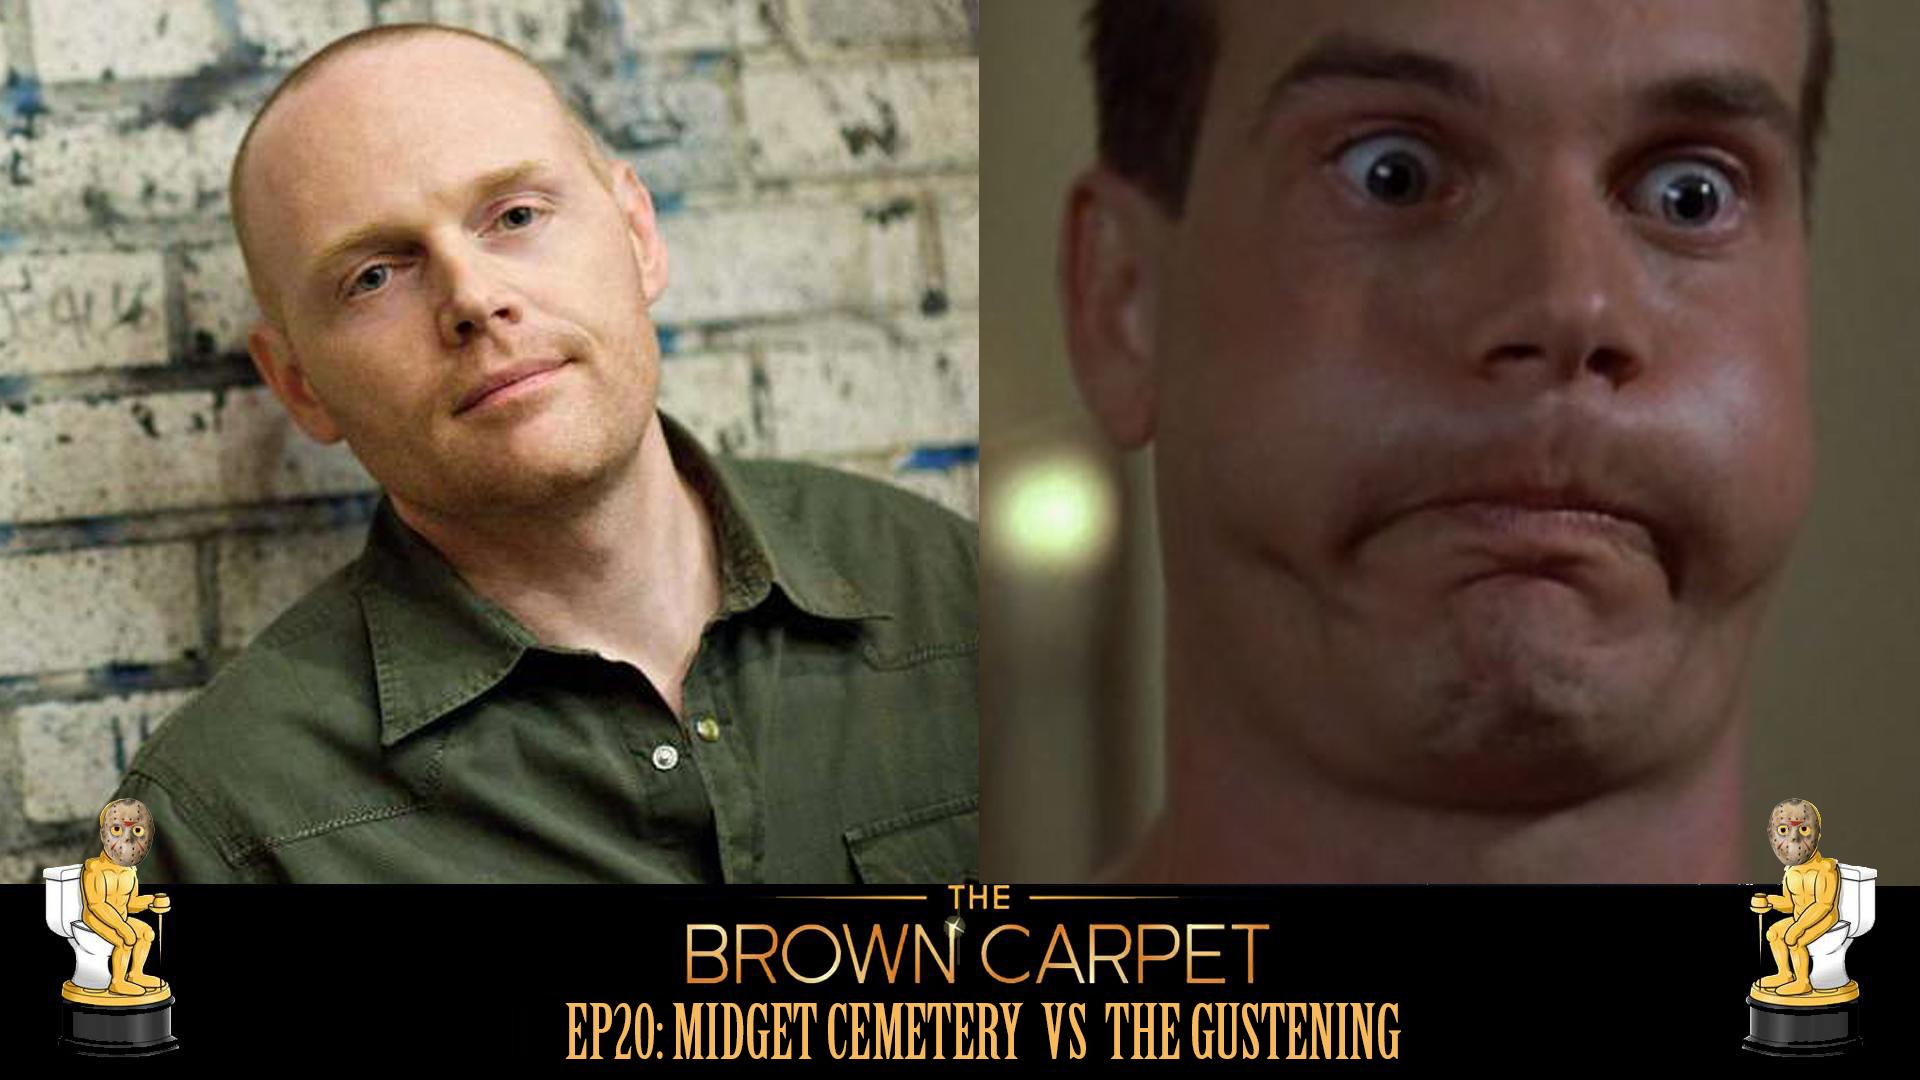 13/04/18 - EP20 - Midget Cemetery vs The Gustening